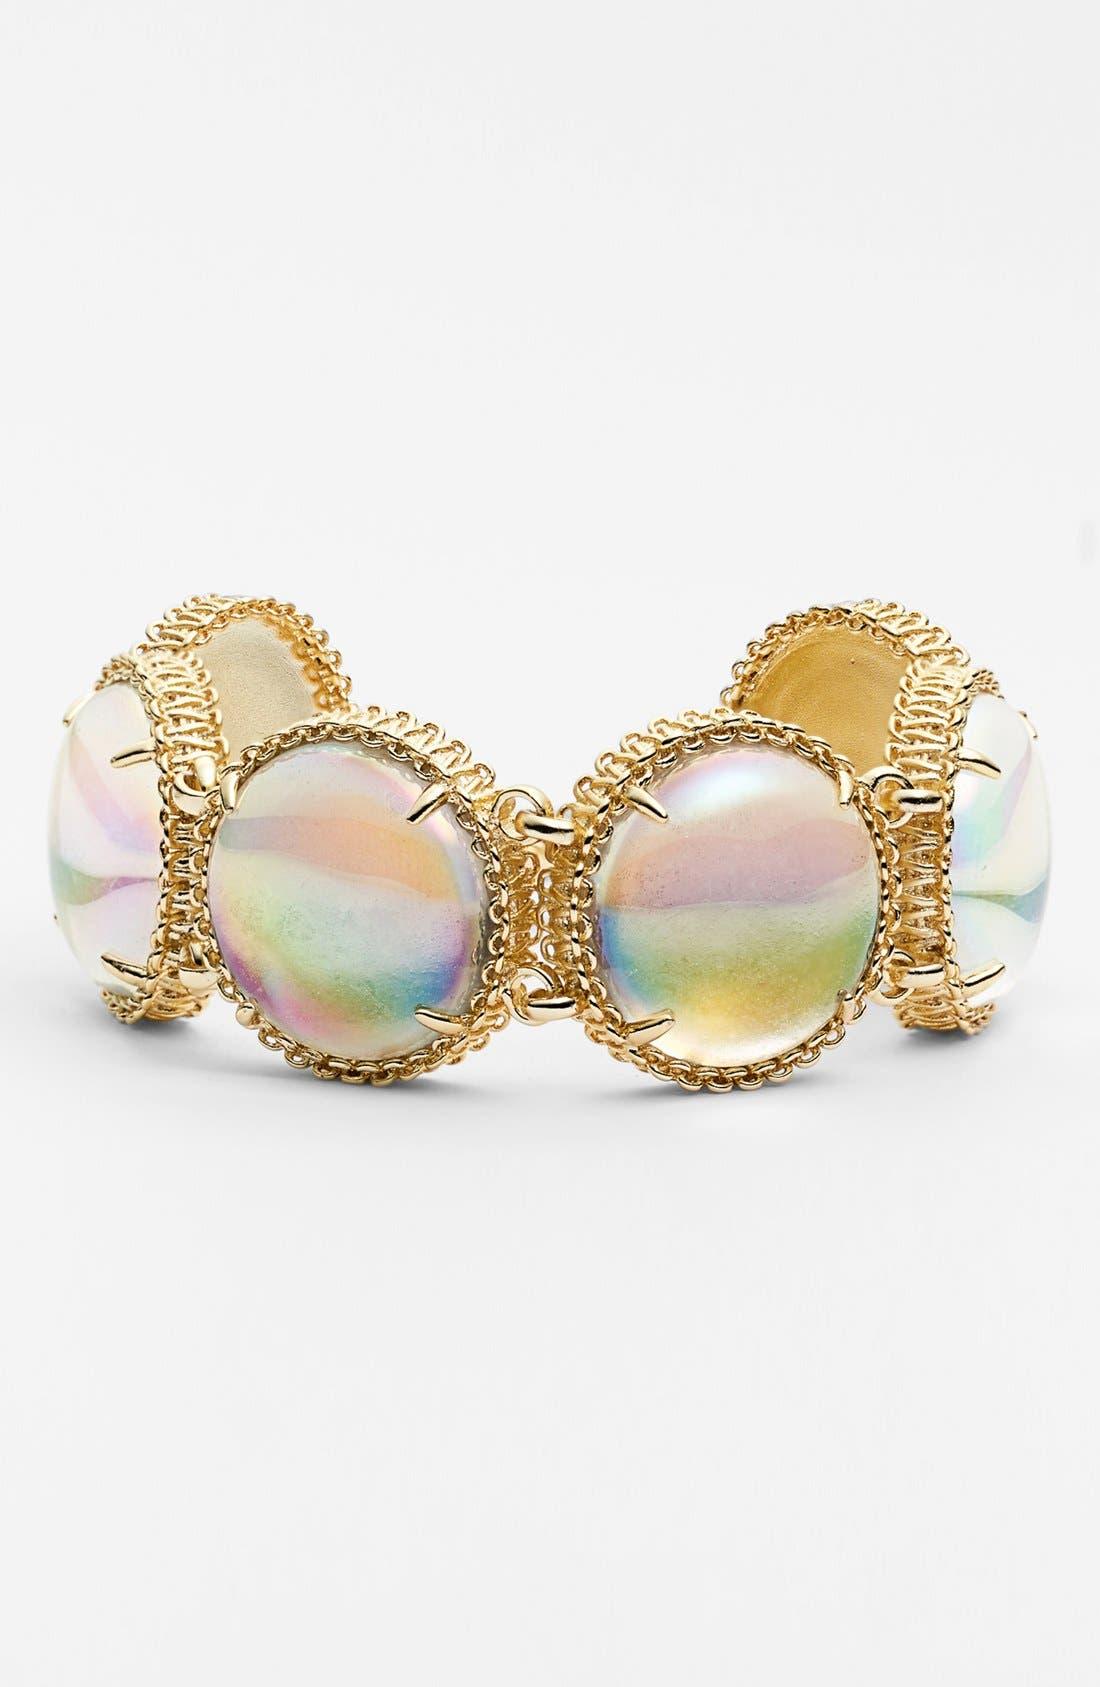 Alternate Image 1 Selected - Kendra Scott 'Ailee' Bracelet